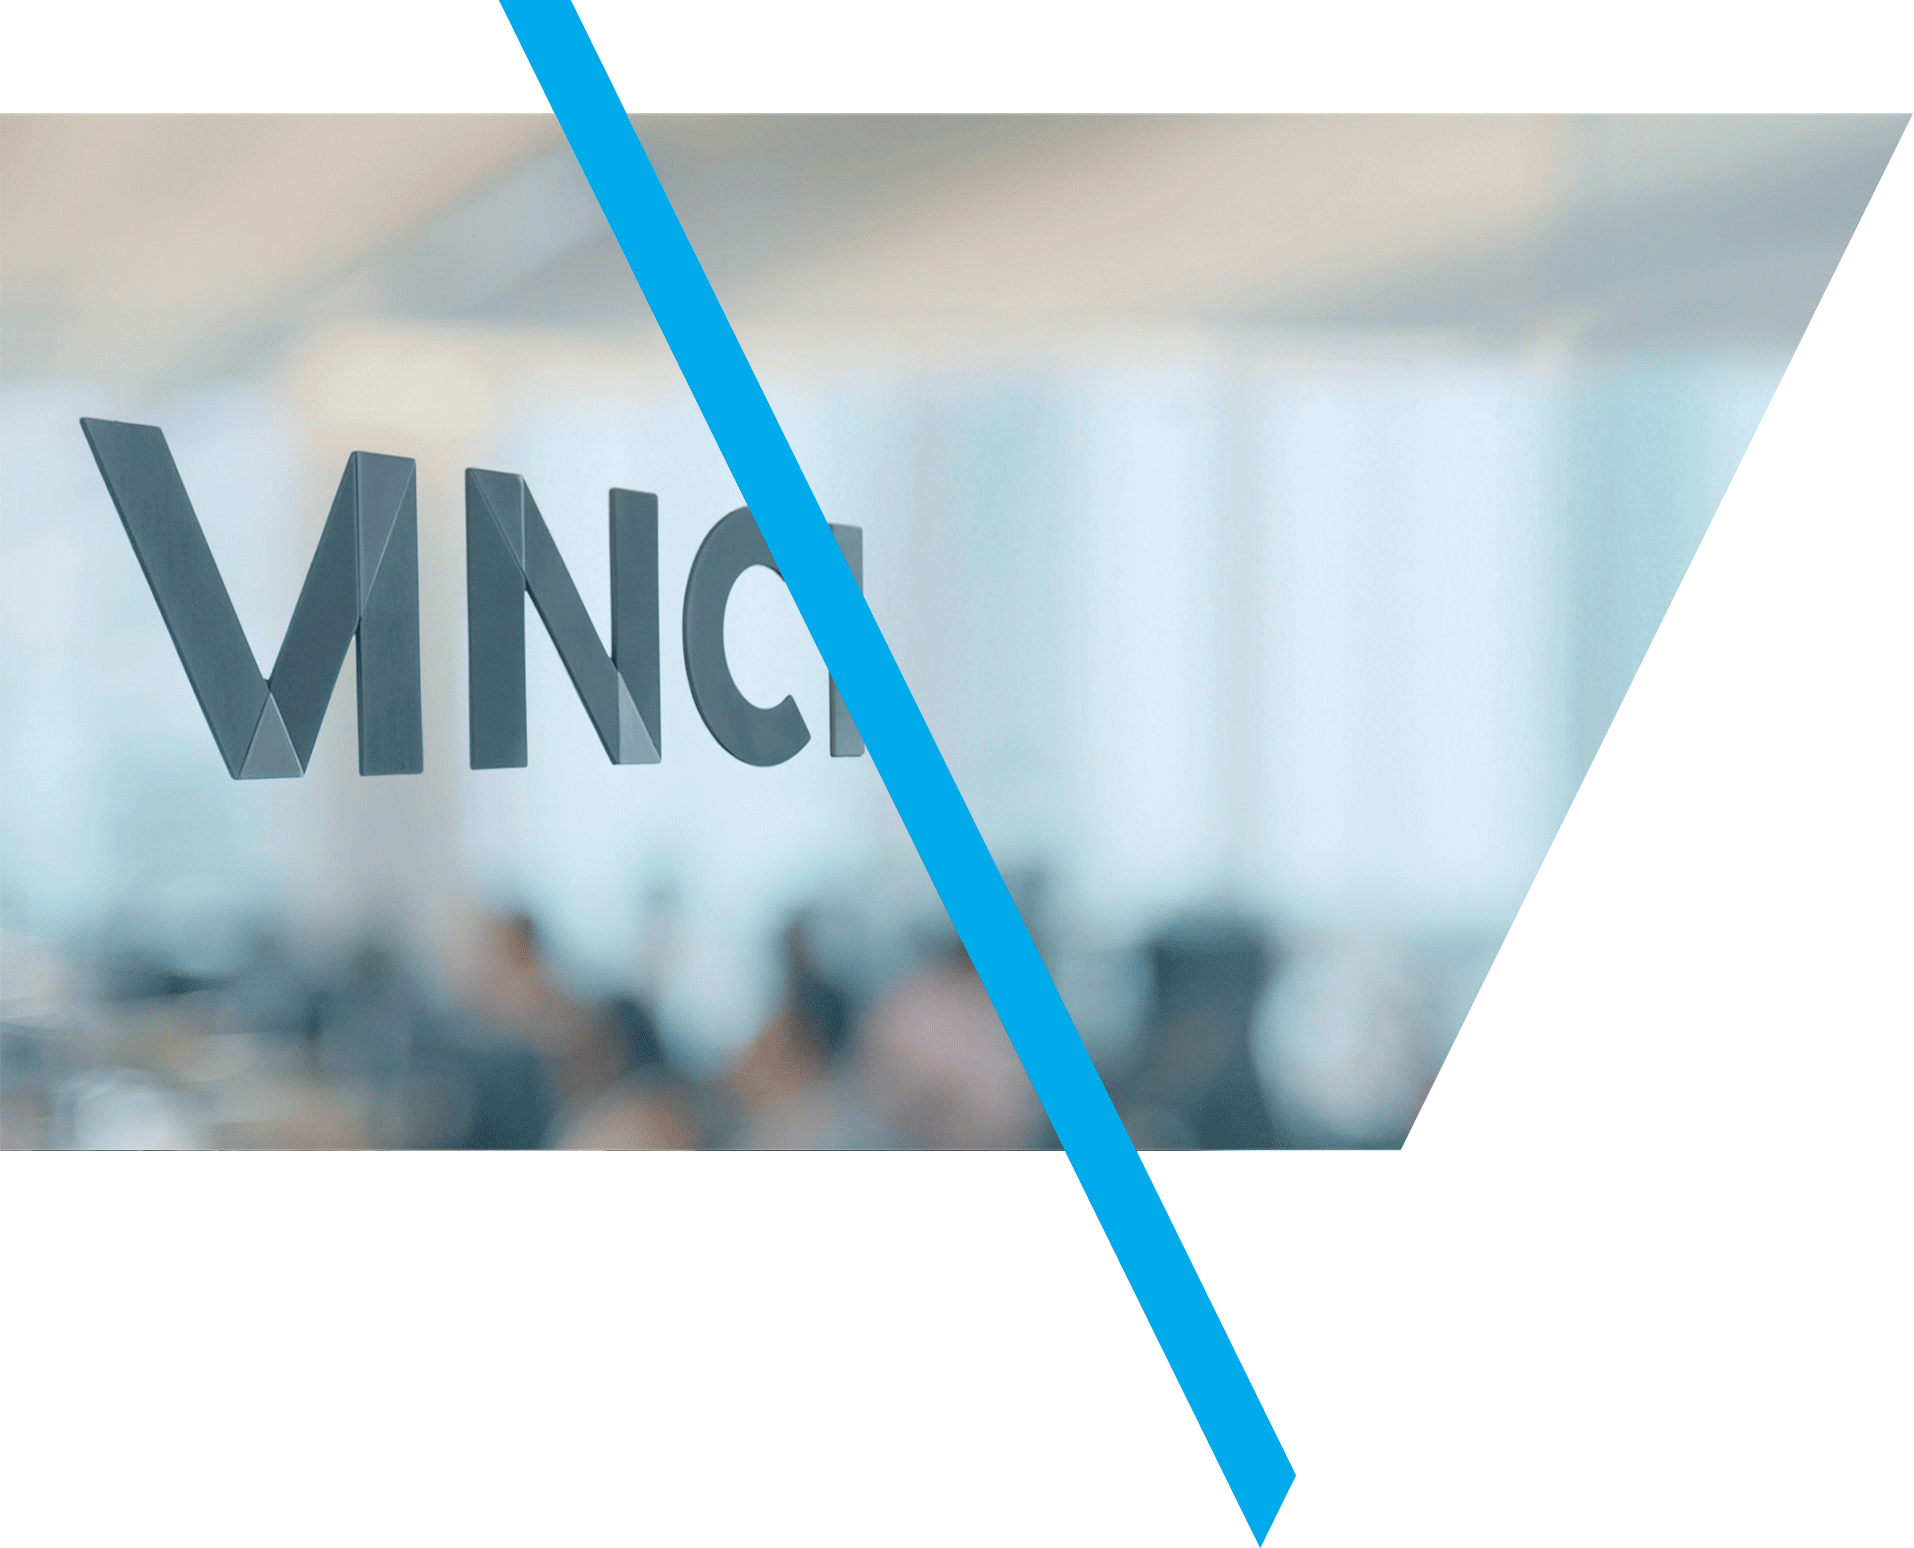 Vinci Partners Initial Public Offering IPO